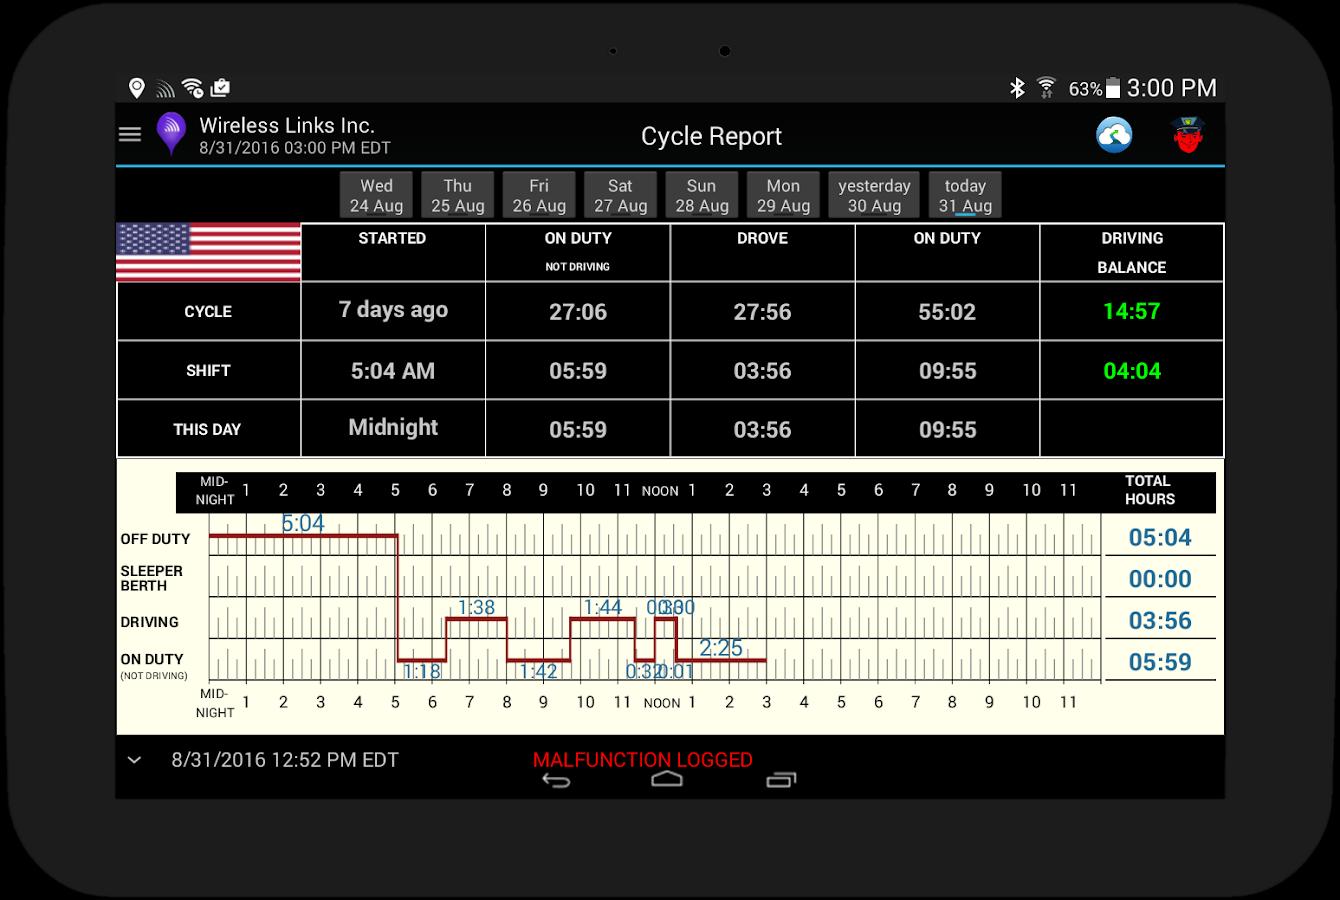 Driverlog logbook screenshot